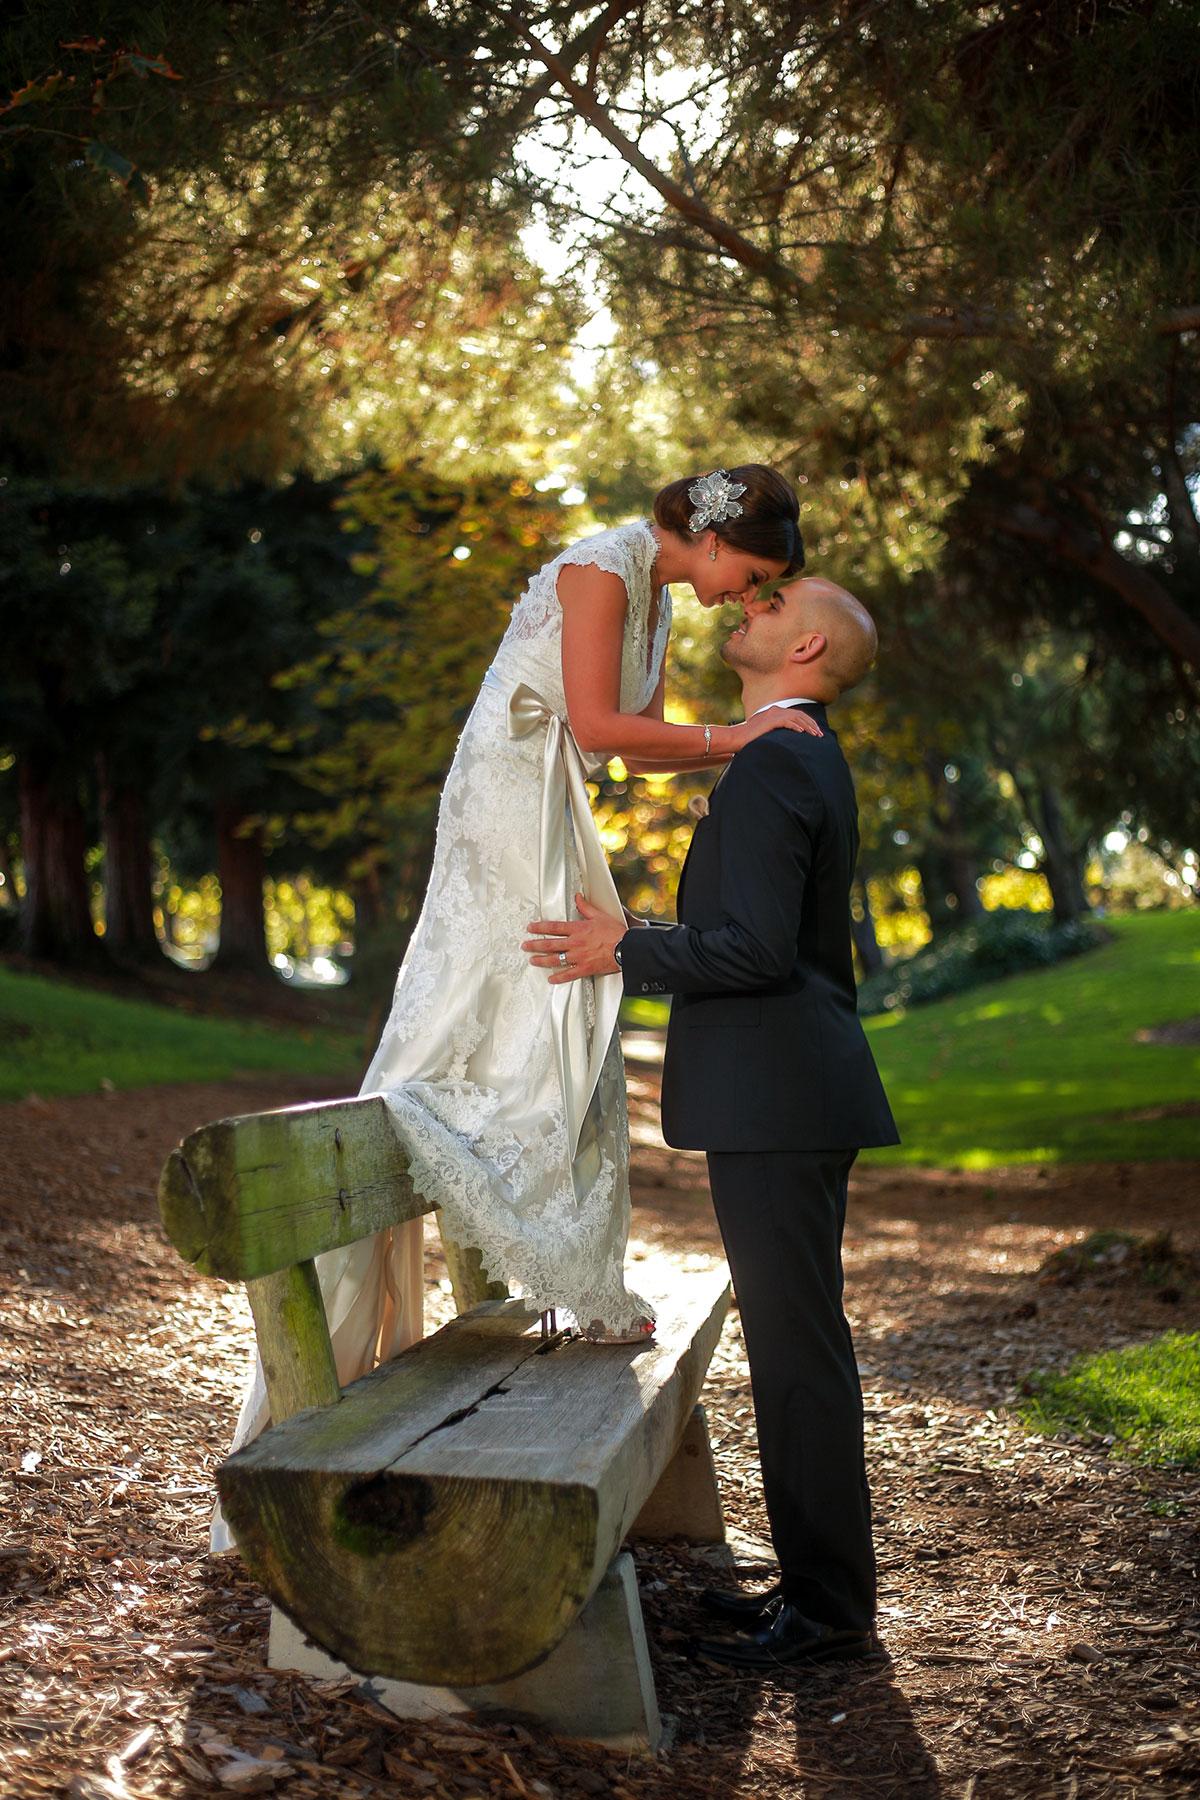 Atefeh_Kambiz_Wedding_Chicago_004.jpg